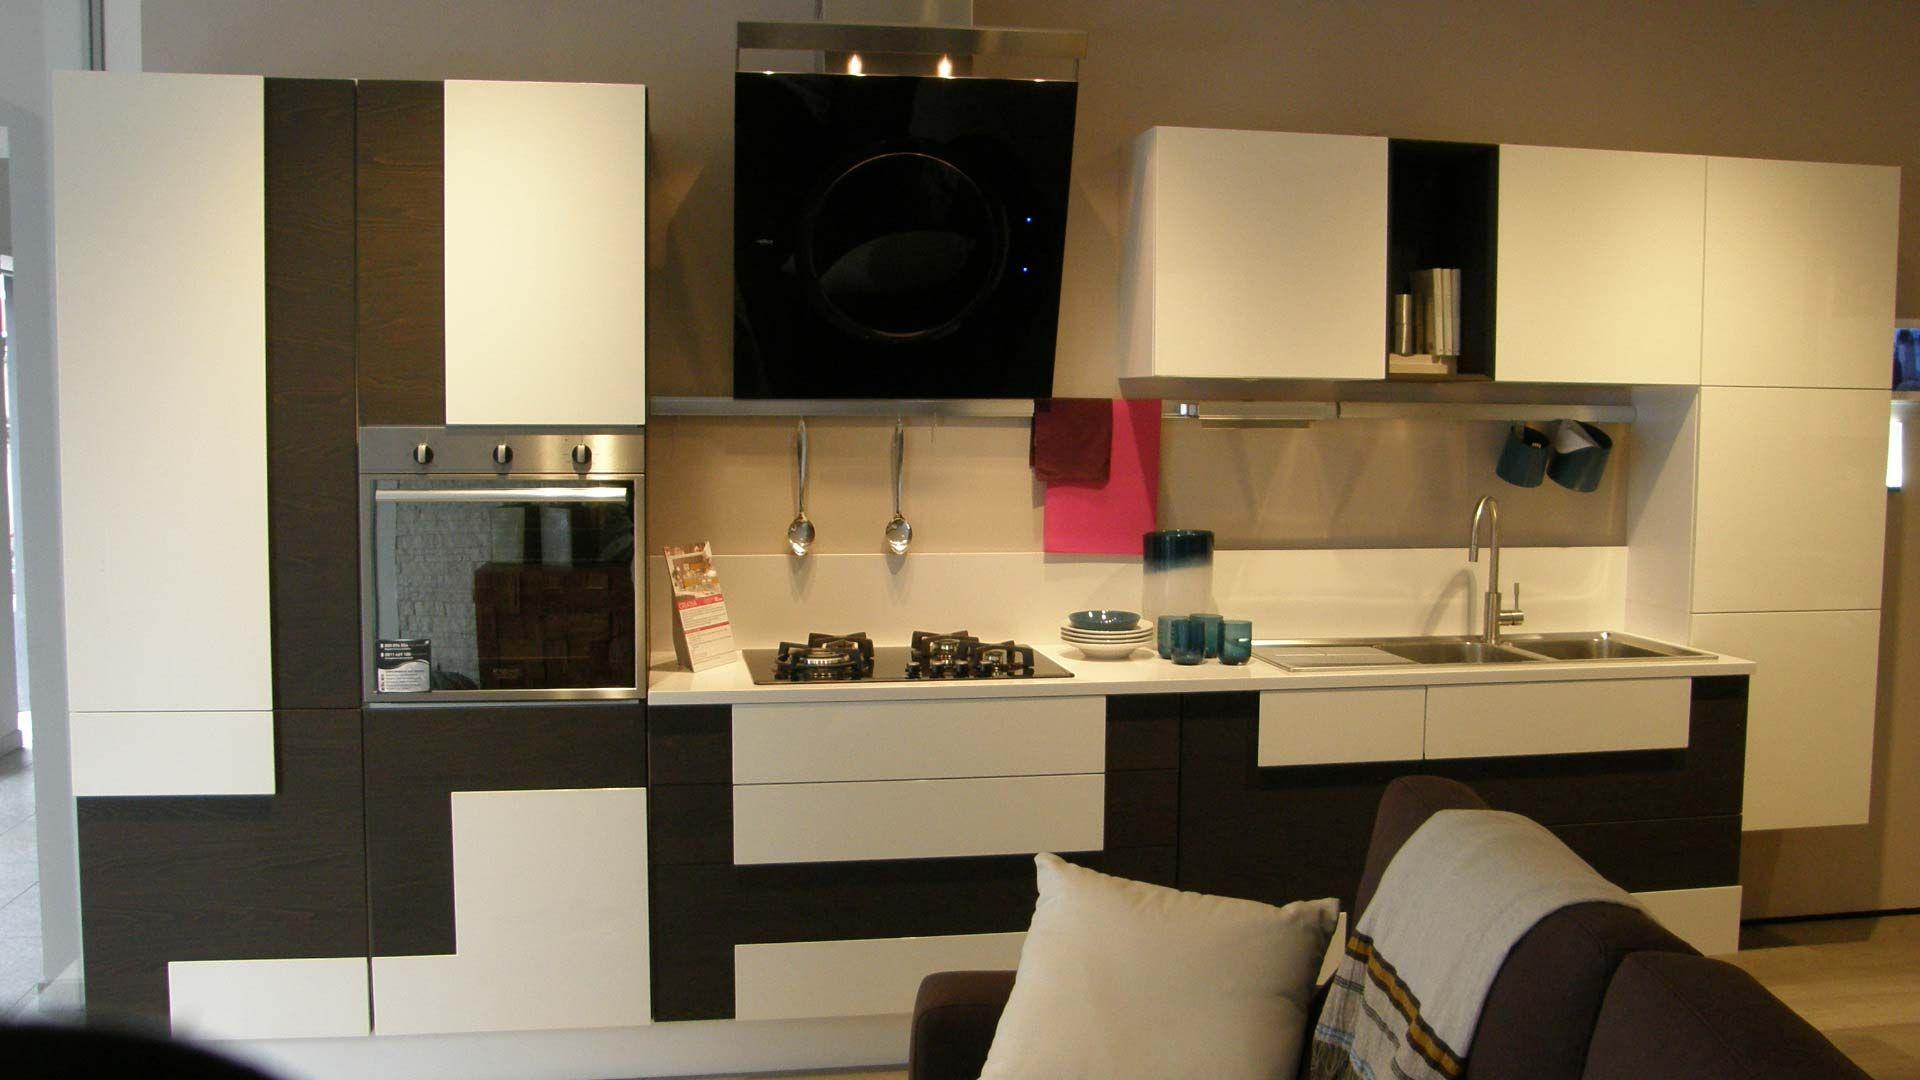 CUCINE LUBE TORINO | Cucine, Moderno, Cucina moderna